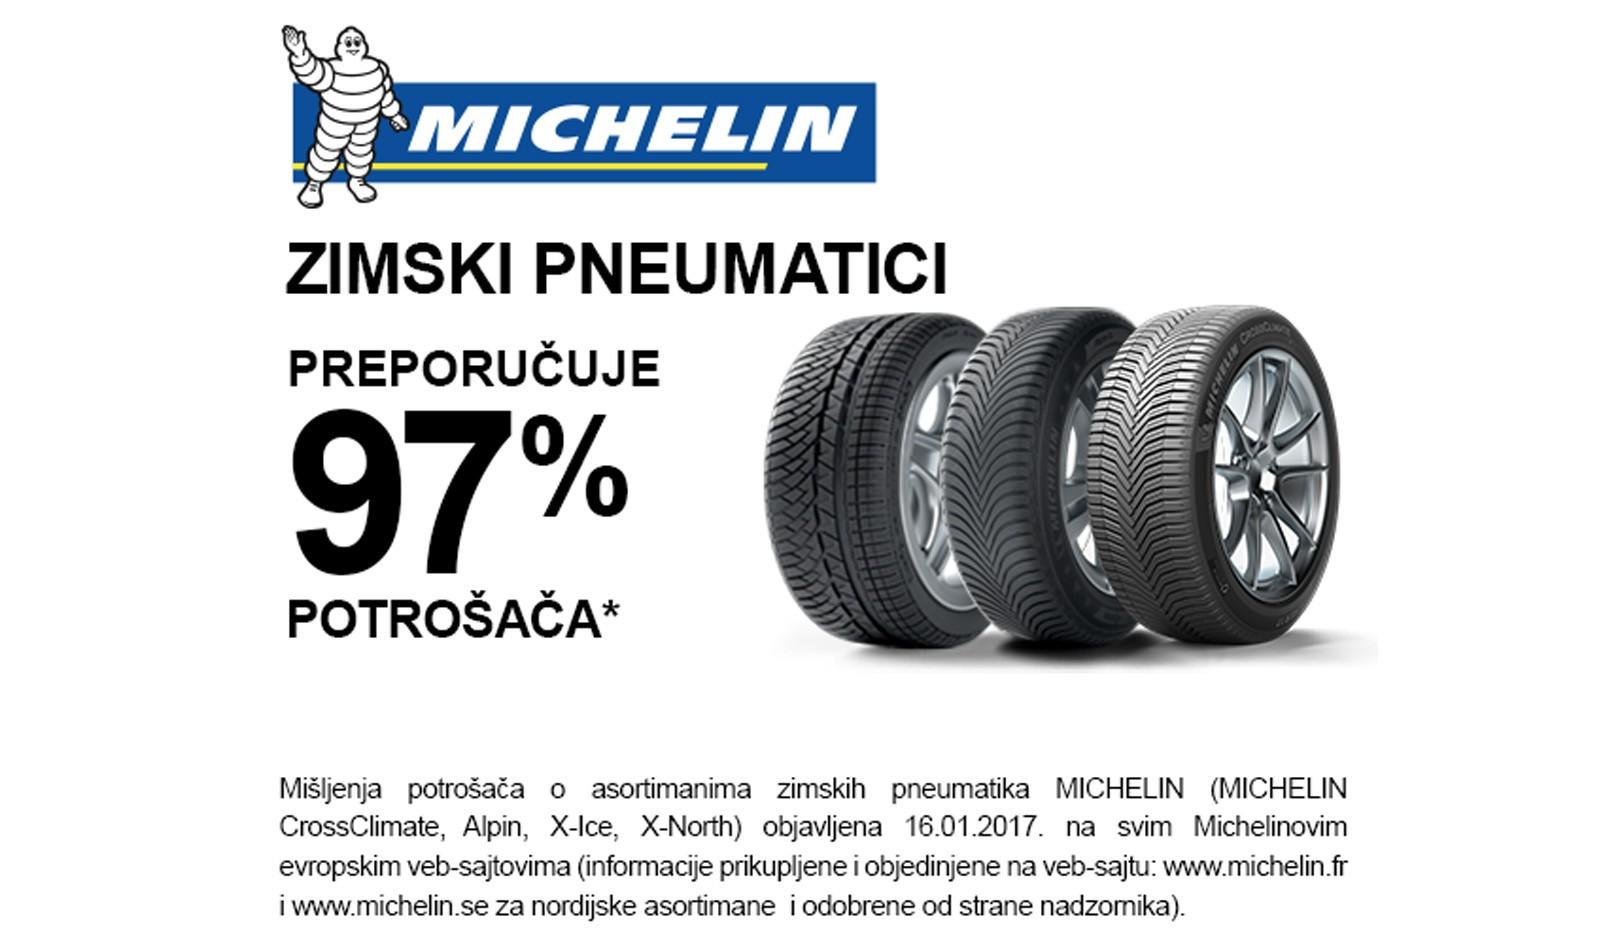 Michelin zima 2017-2018